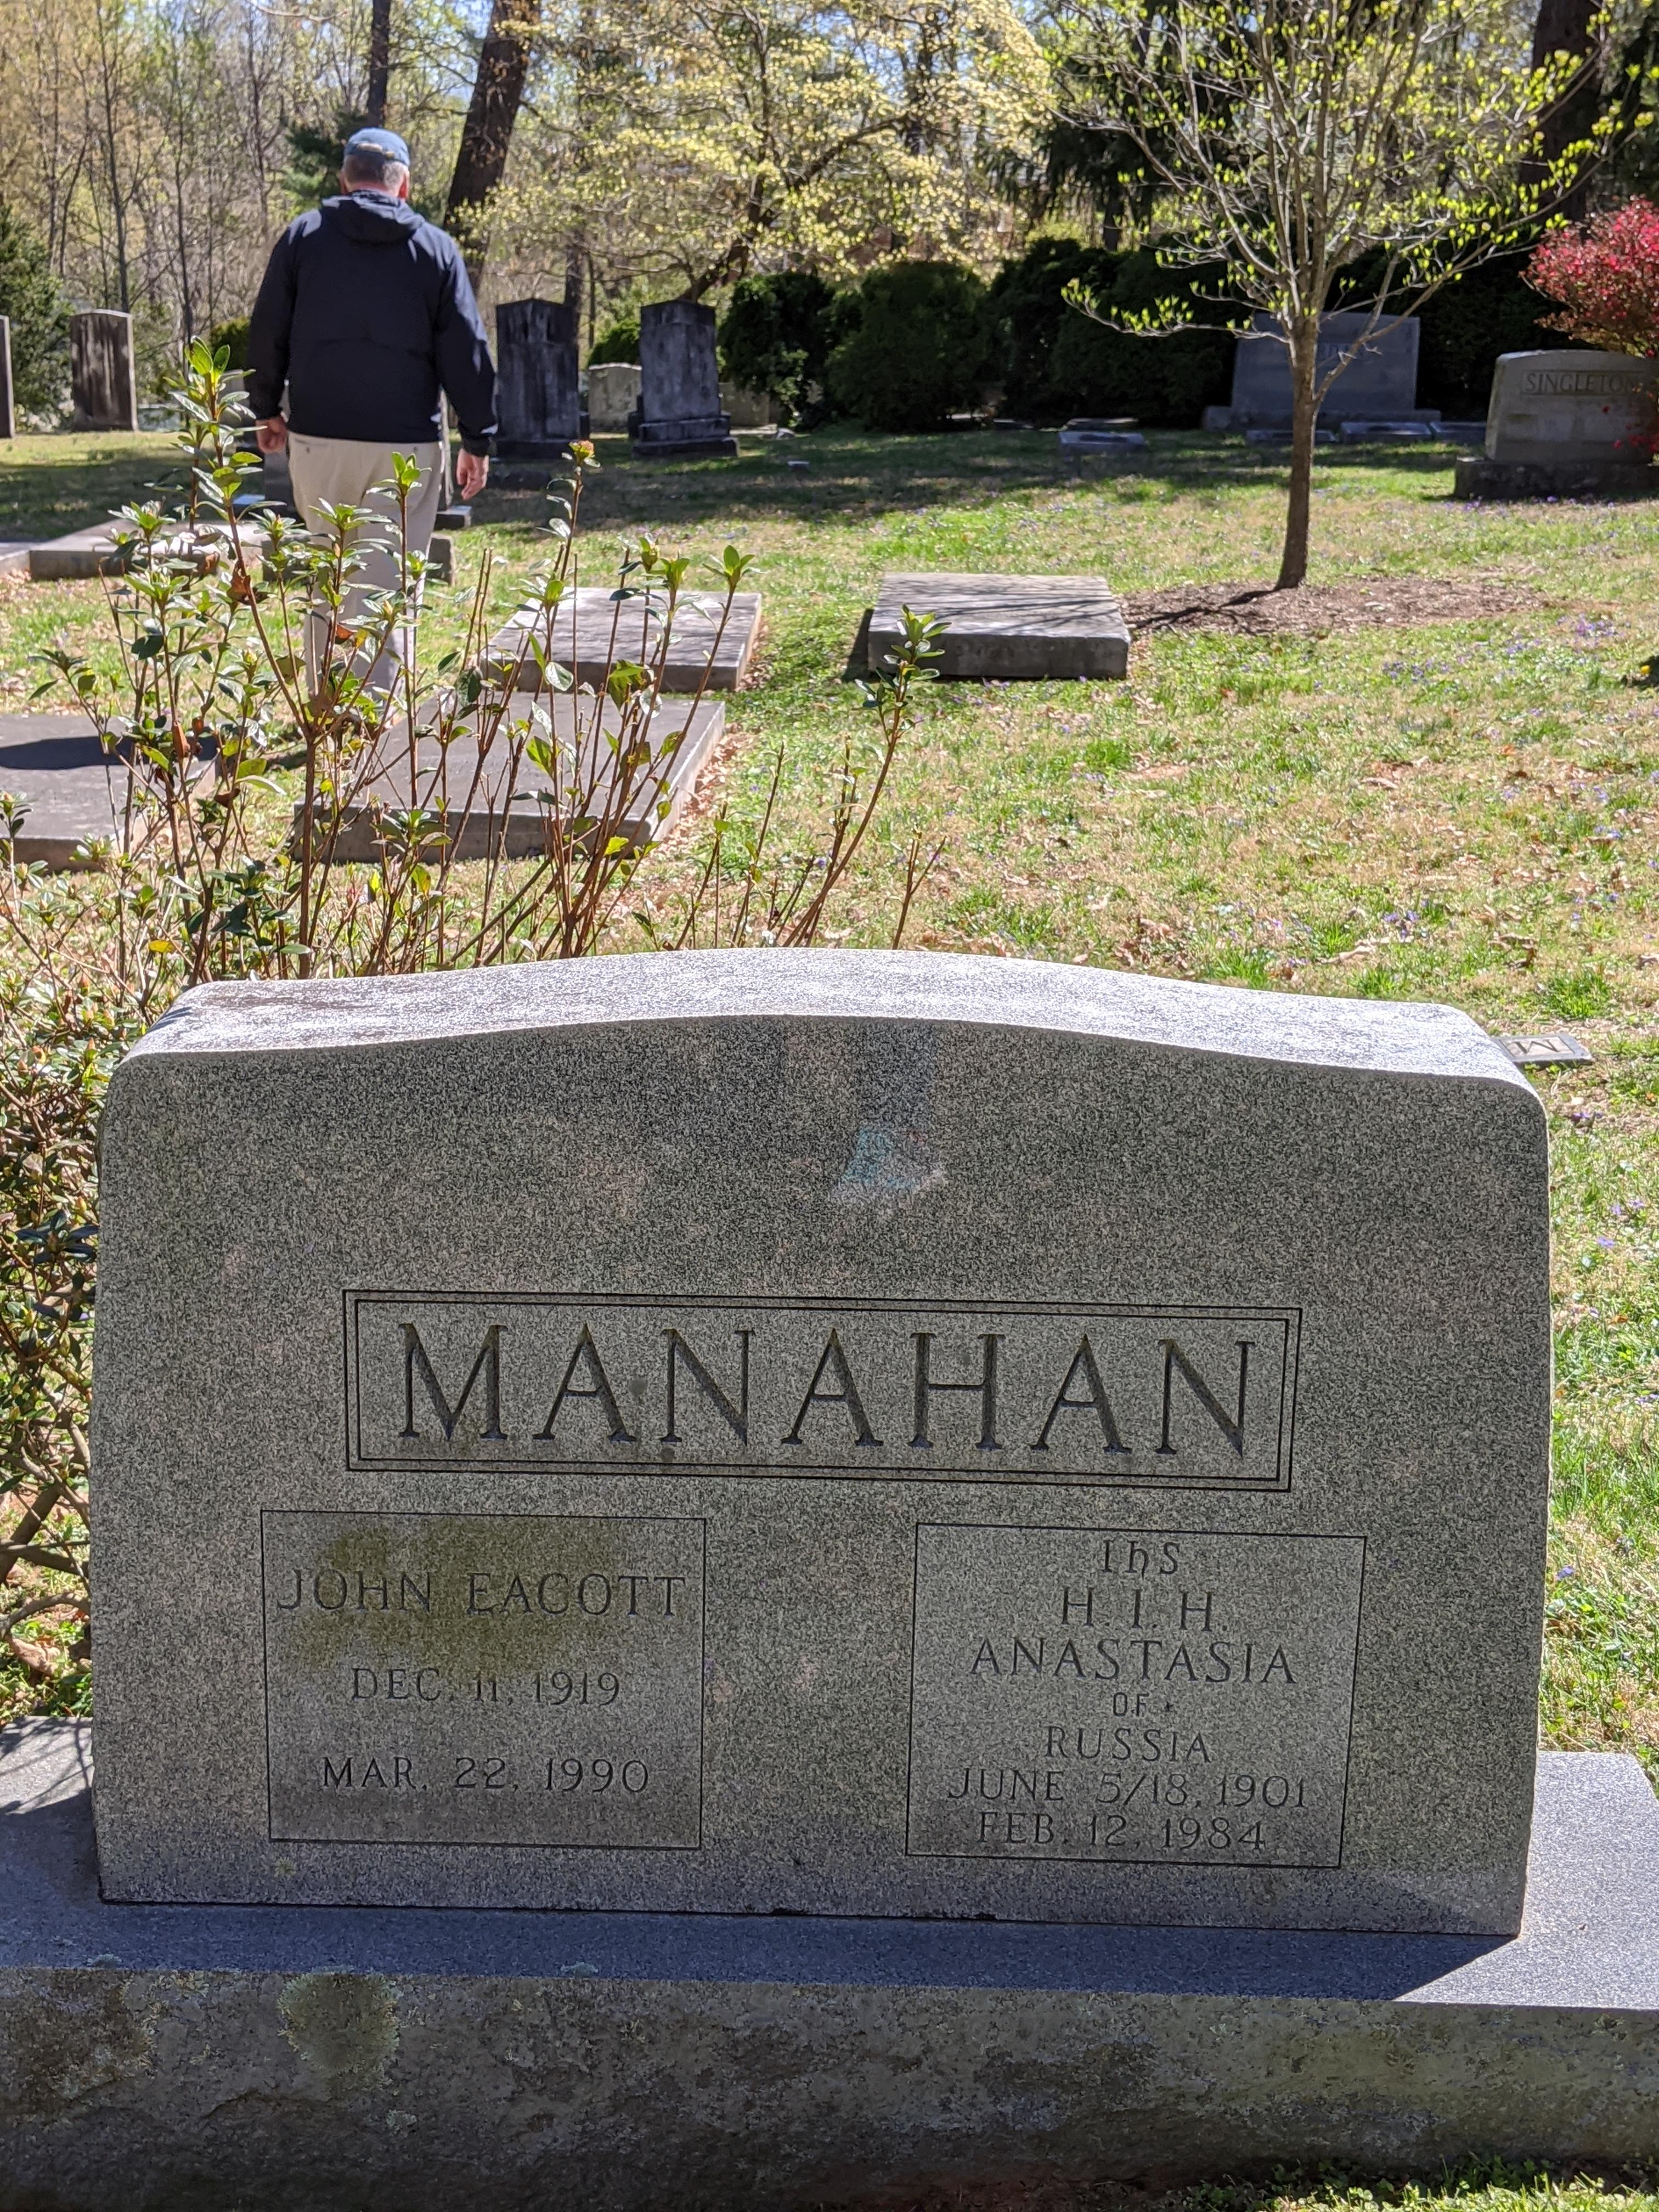 Mahan grave in the UVA Graveyard